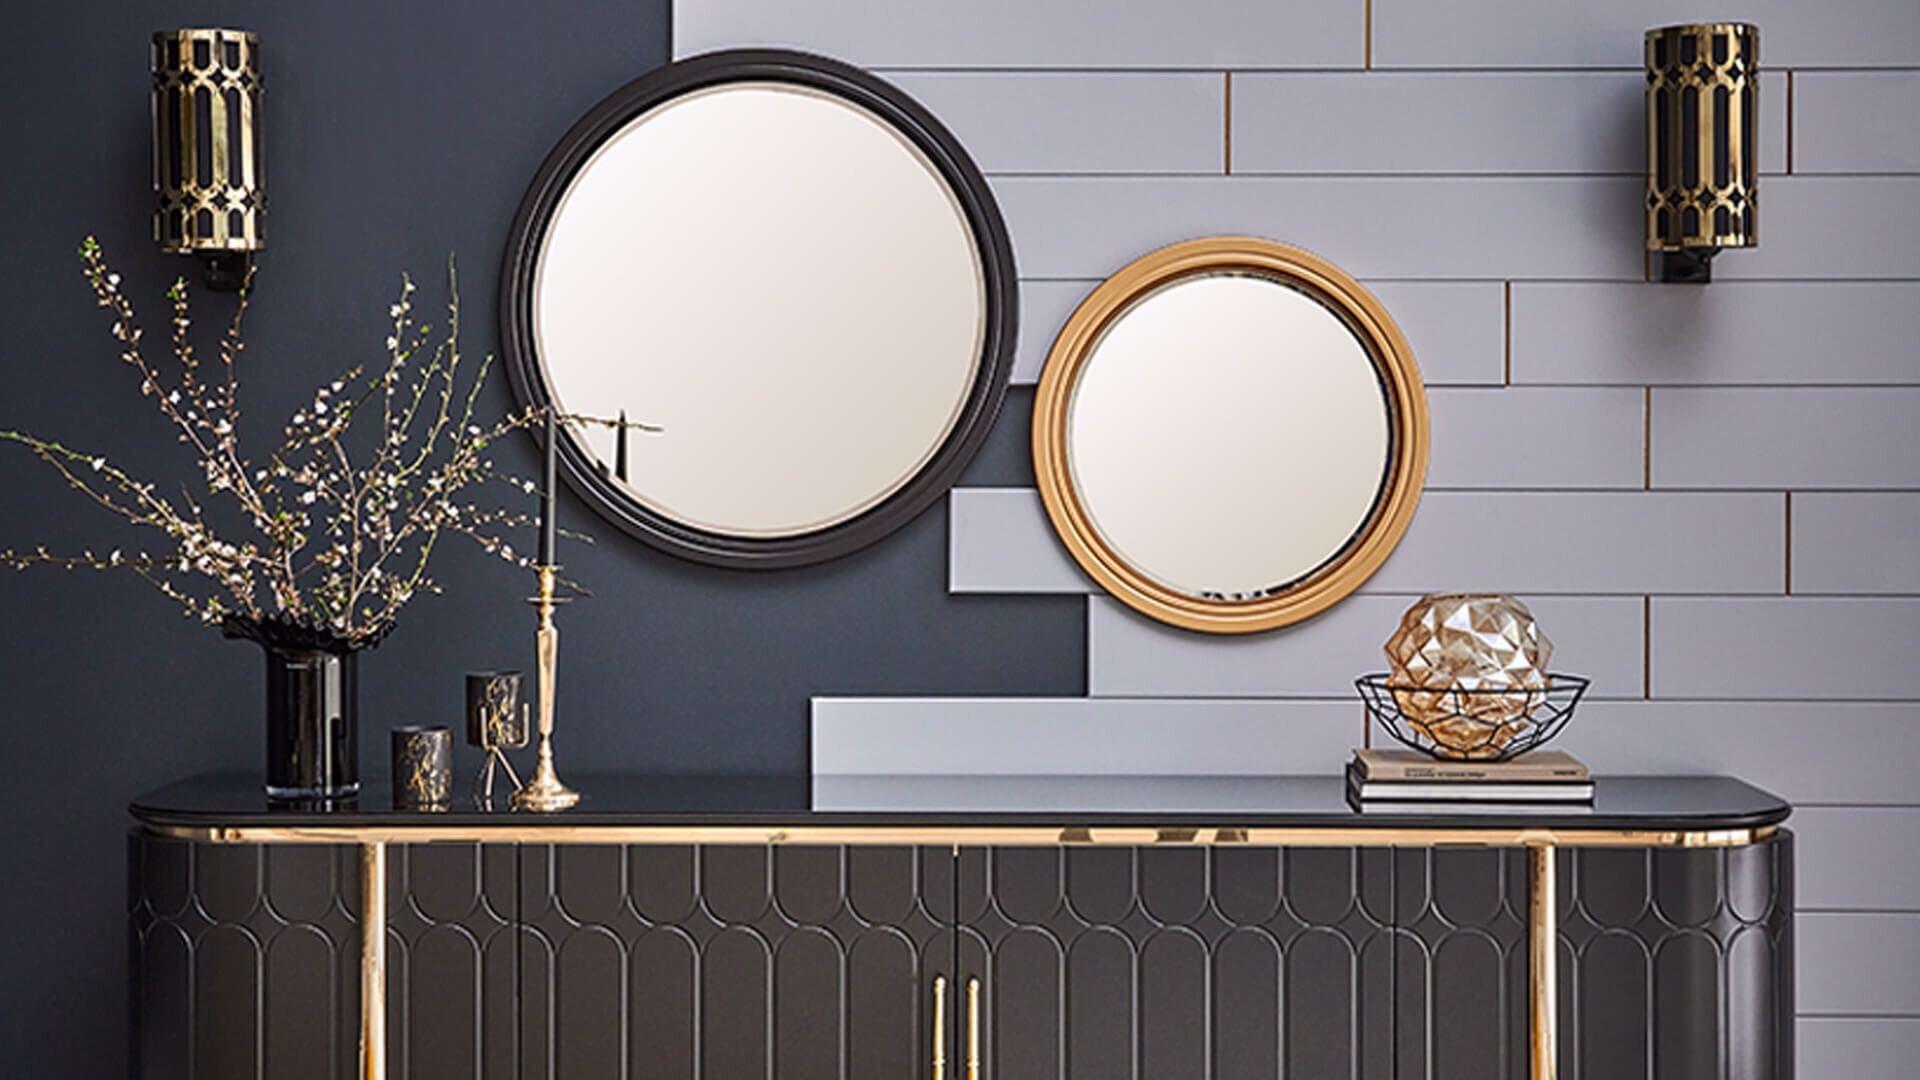 Serenity Konsol Küçük Ayna